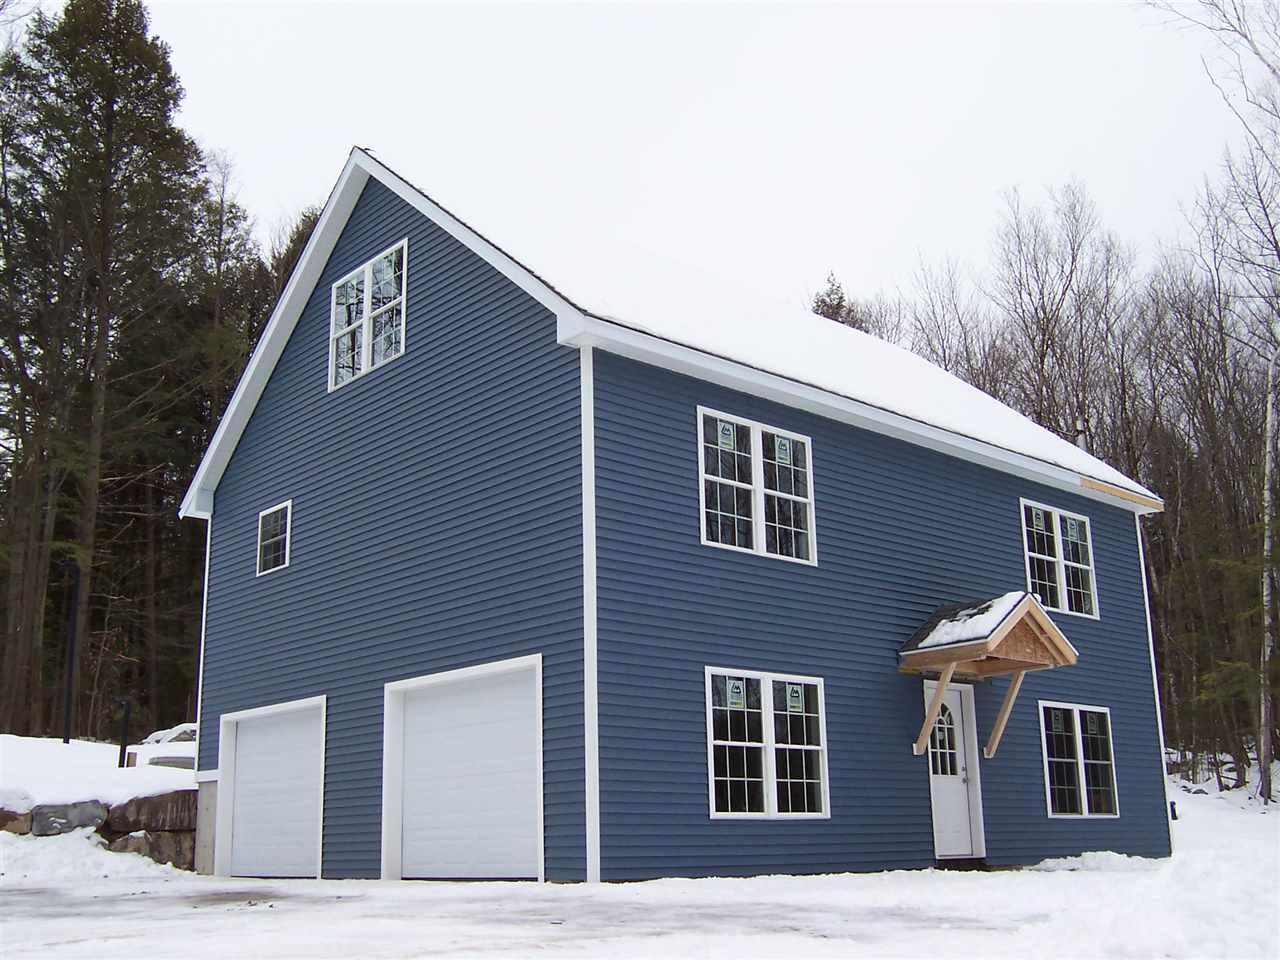 Village of Alton Bay in Town of Alton NHHome for sale $$280,000 $190 per sq.ft.